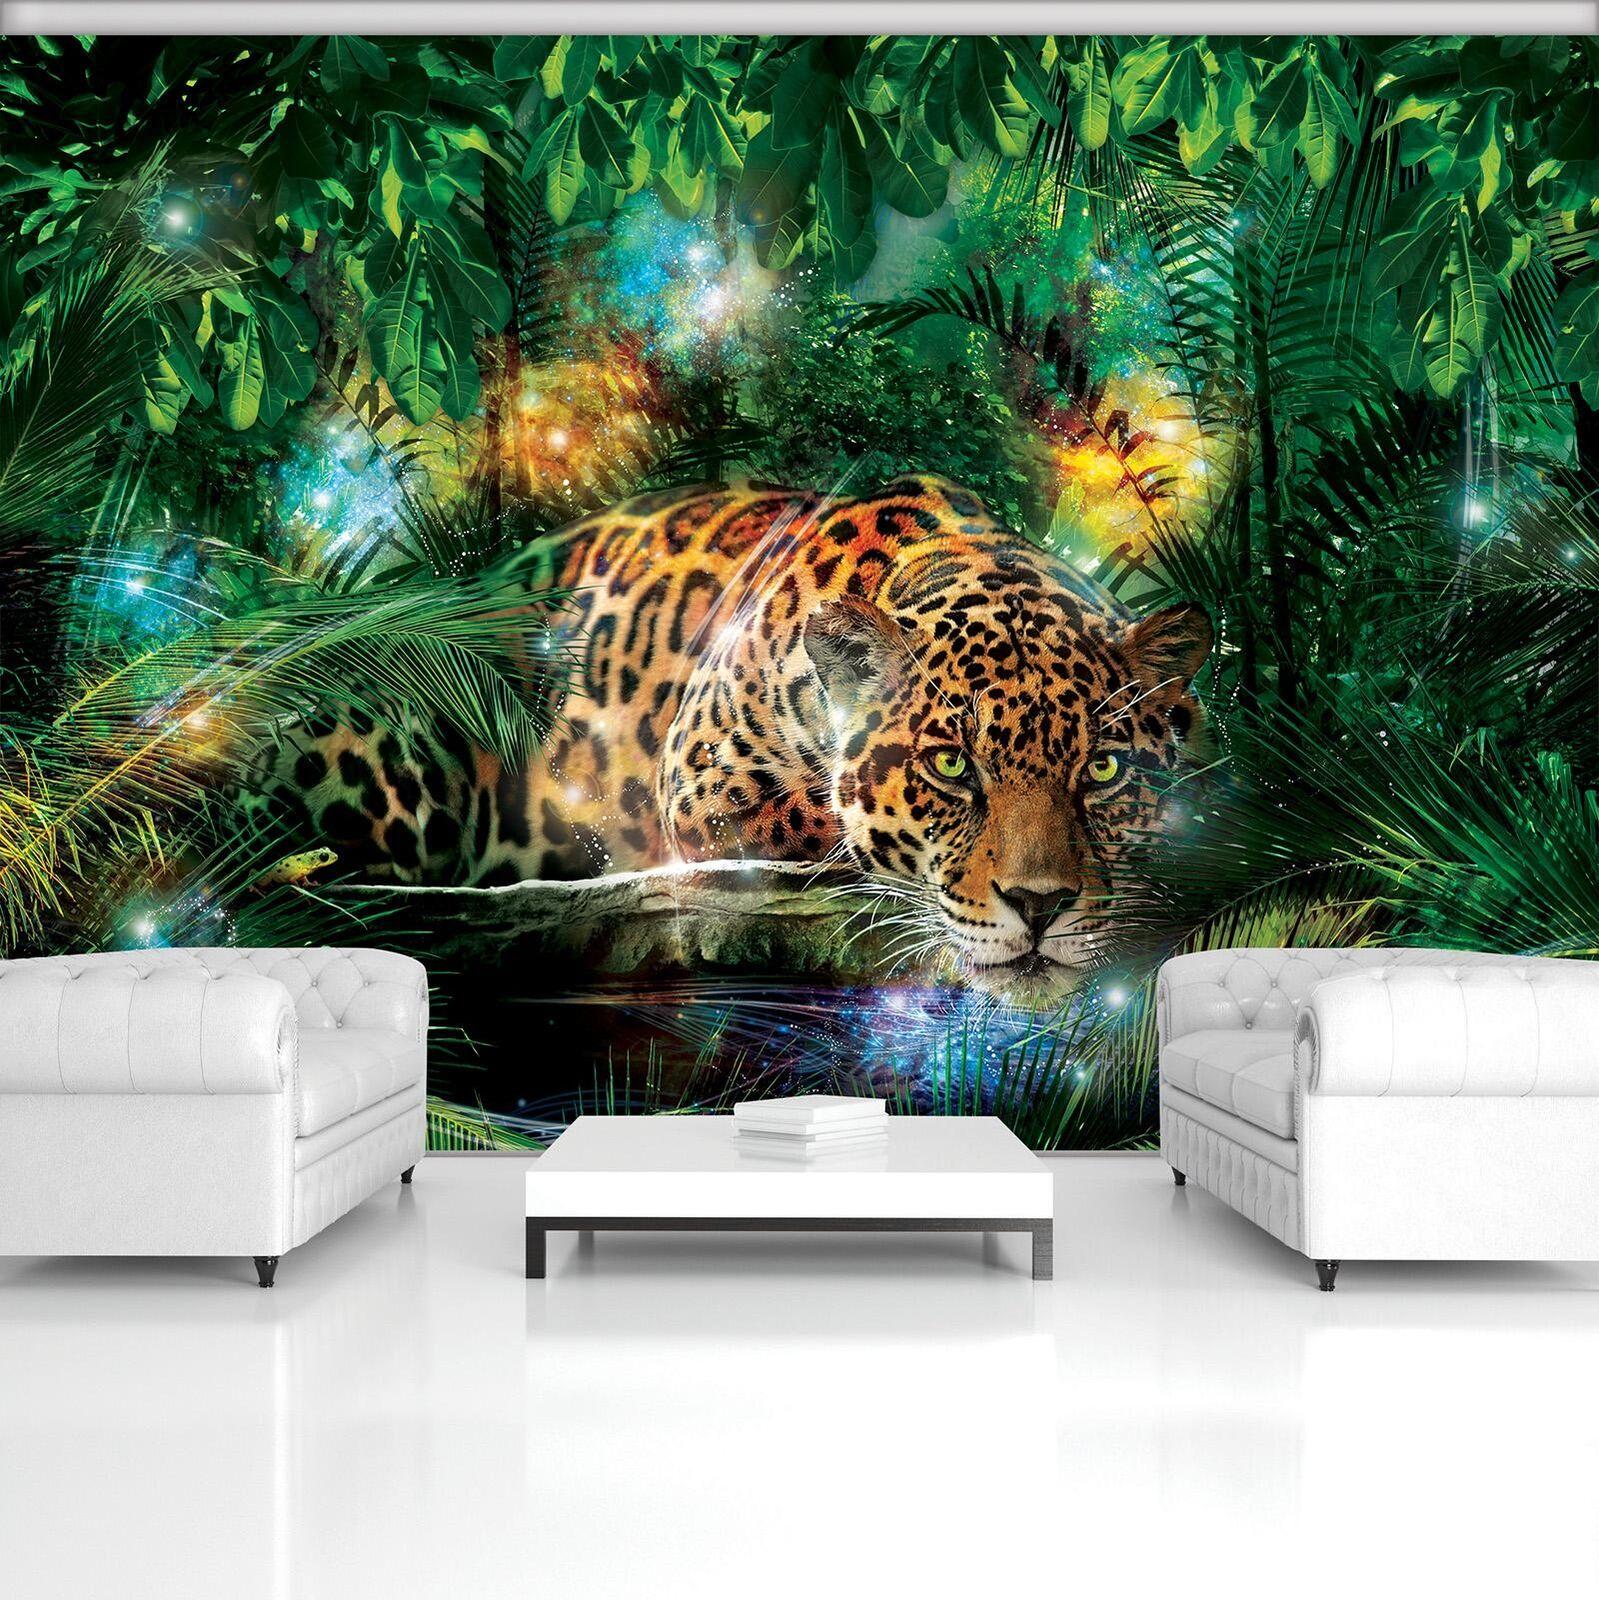 Vließ Fototapete Tapete Wandbild Jaguar im bunten Dschungel 320288_VEMVT